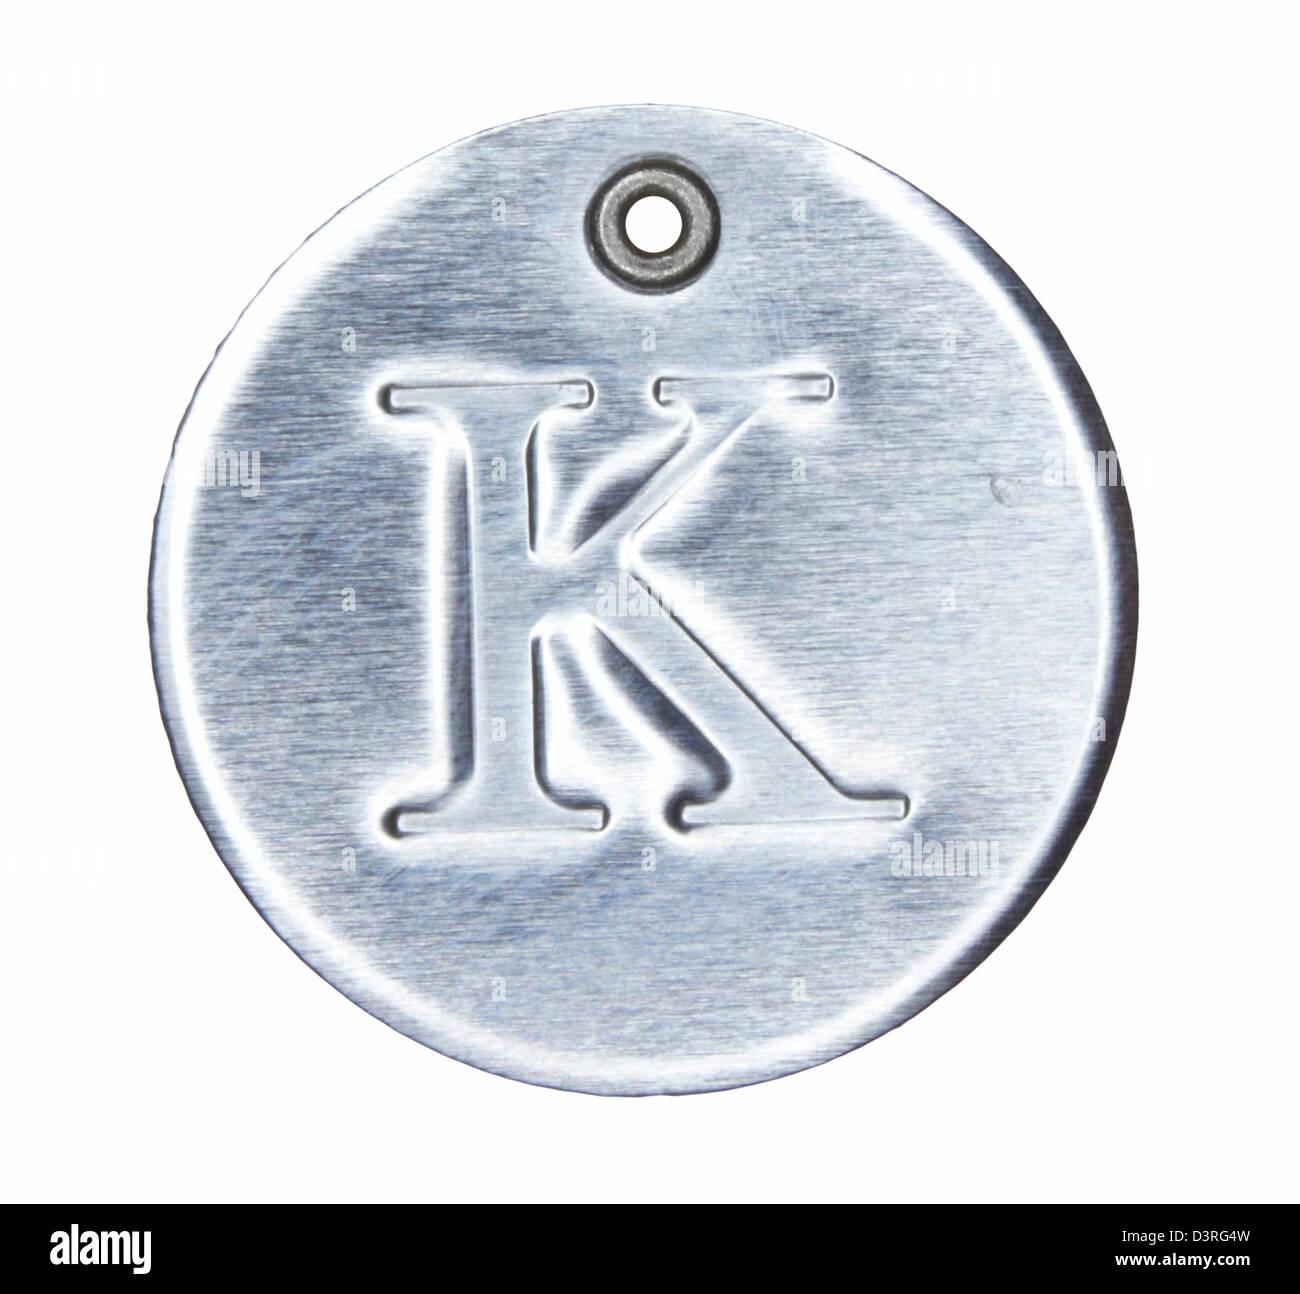 Brushed metal letter of the alphabet K - Stock Image